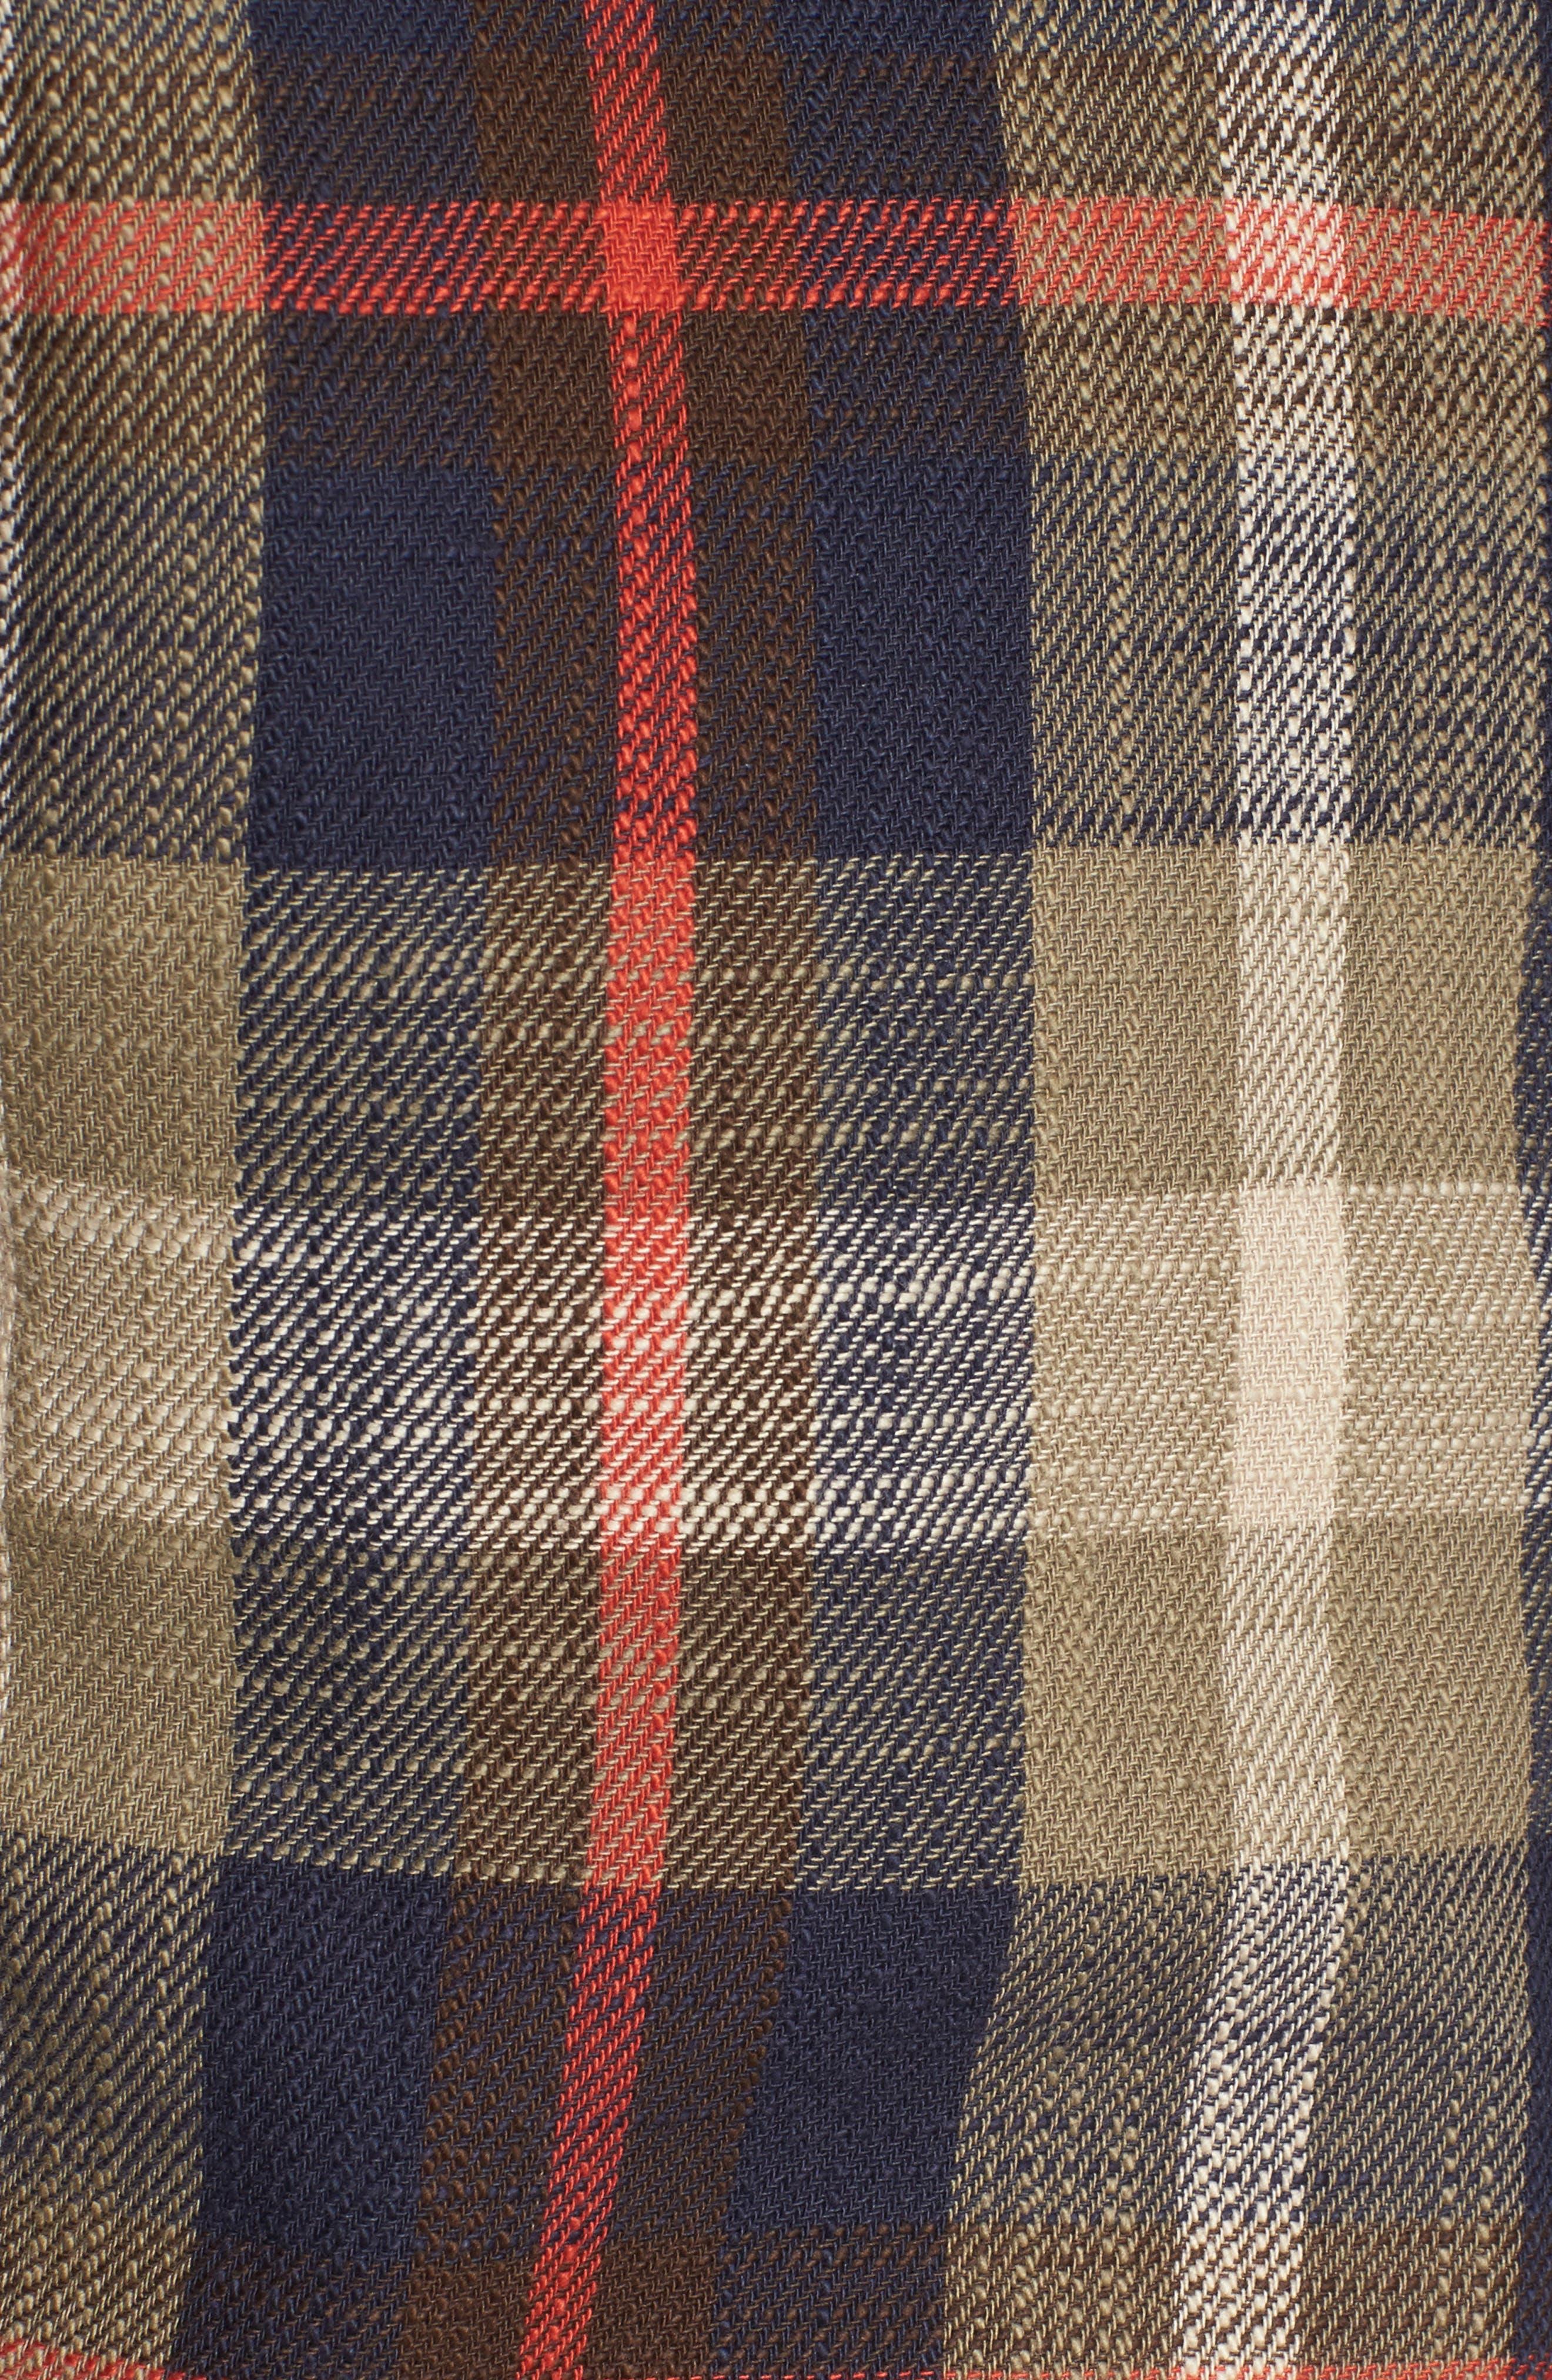 Brae Plaid Flannel Shirt,                             Alternate thumbnail 5, color,                             Green Check